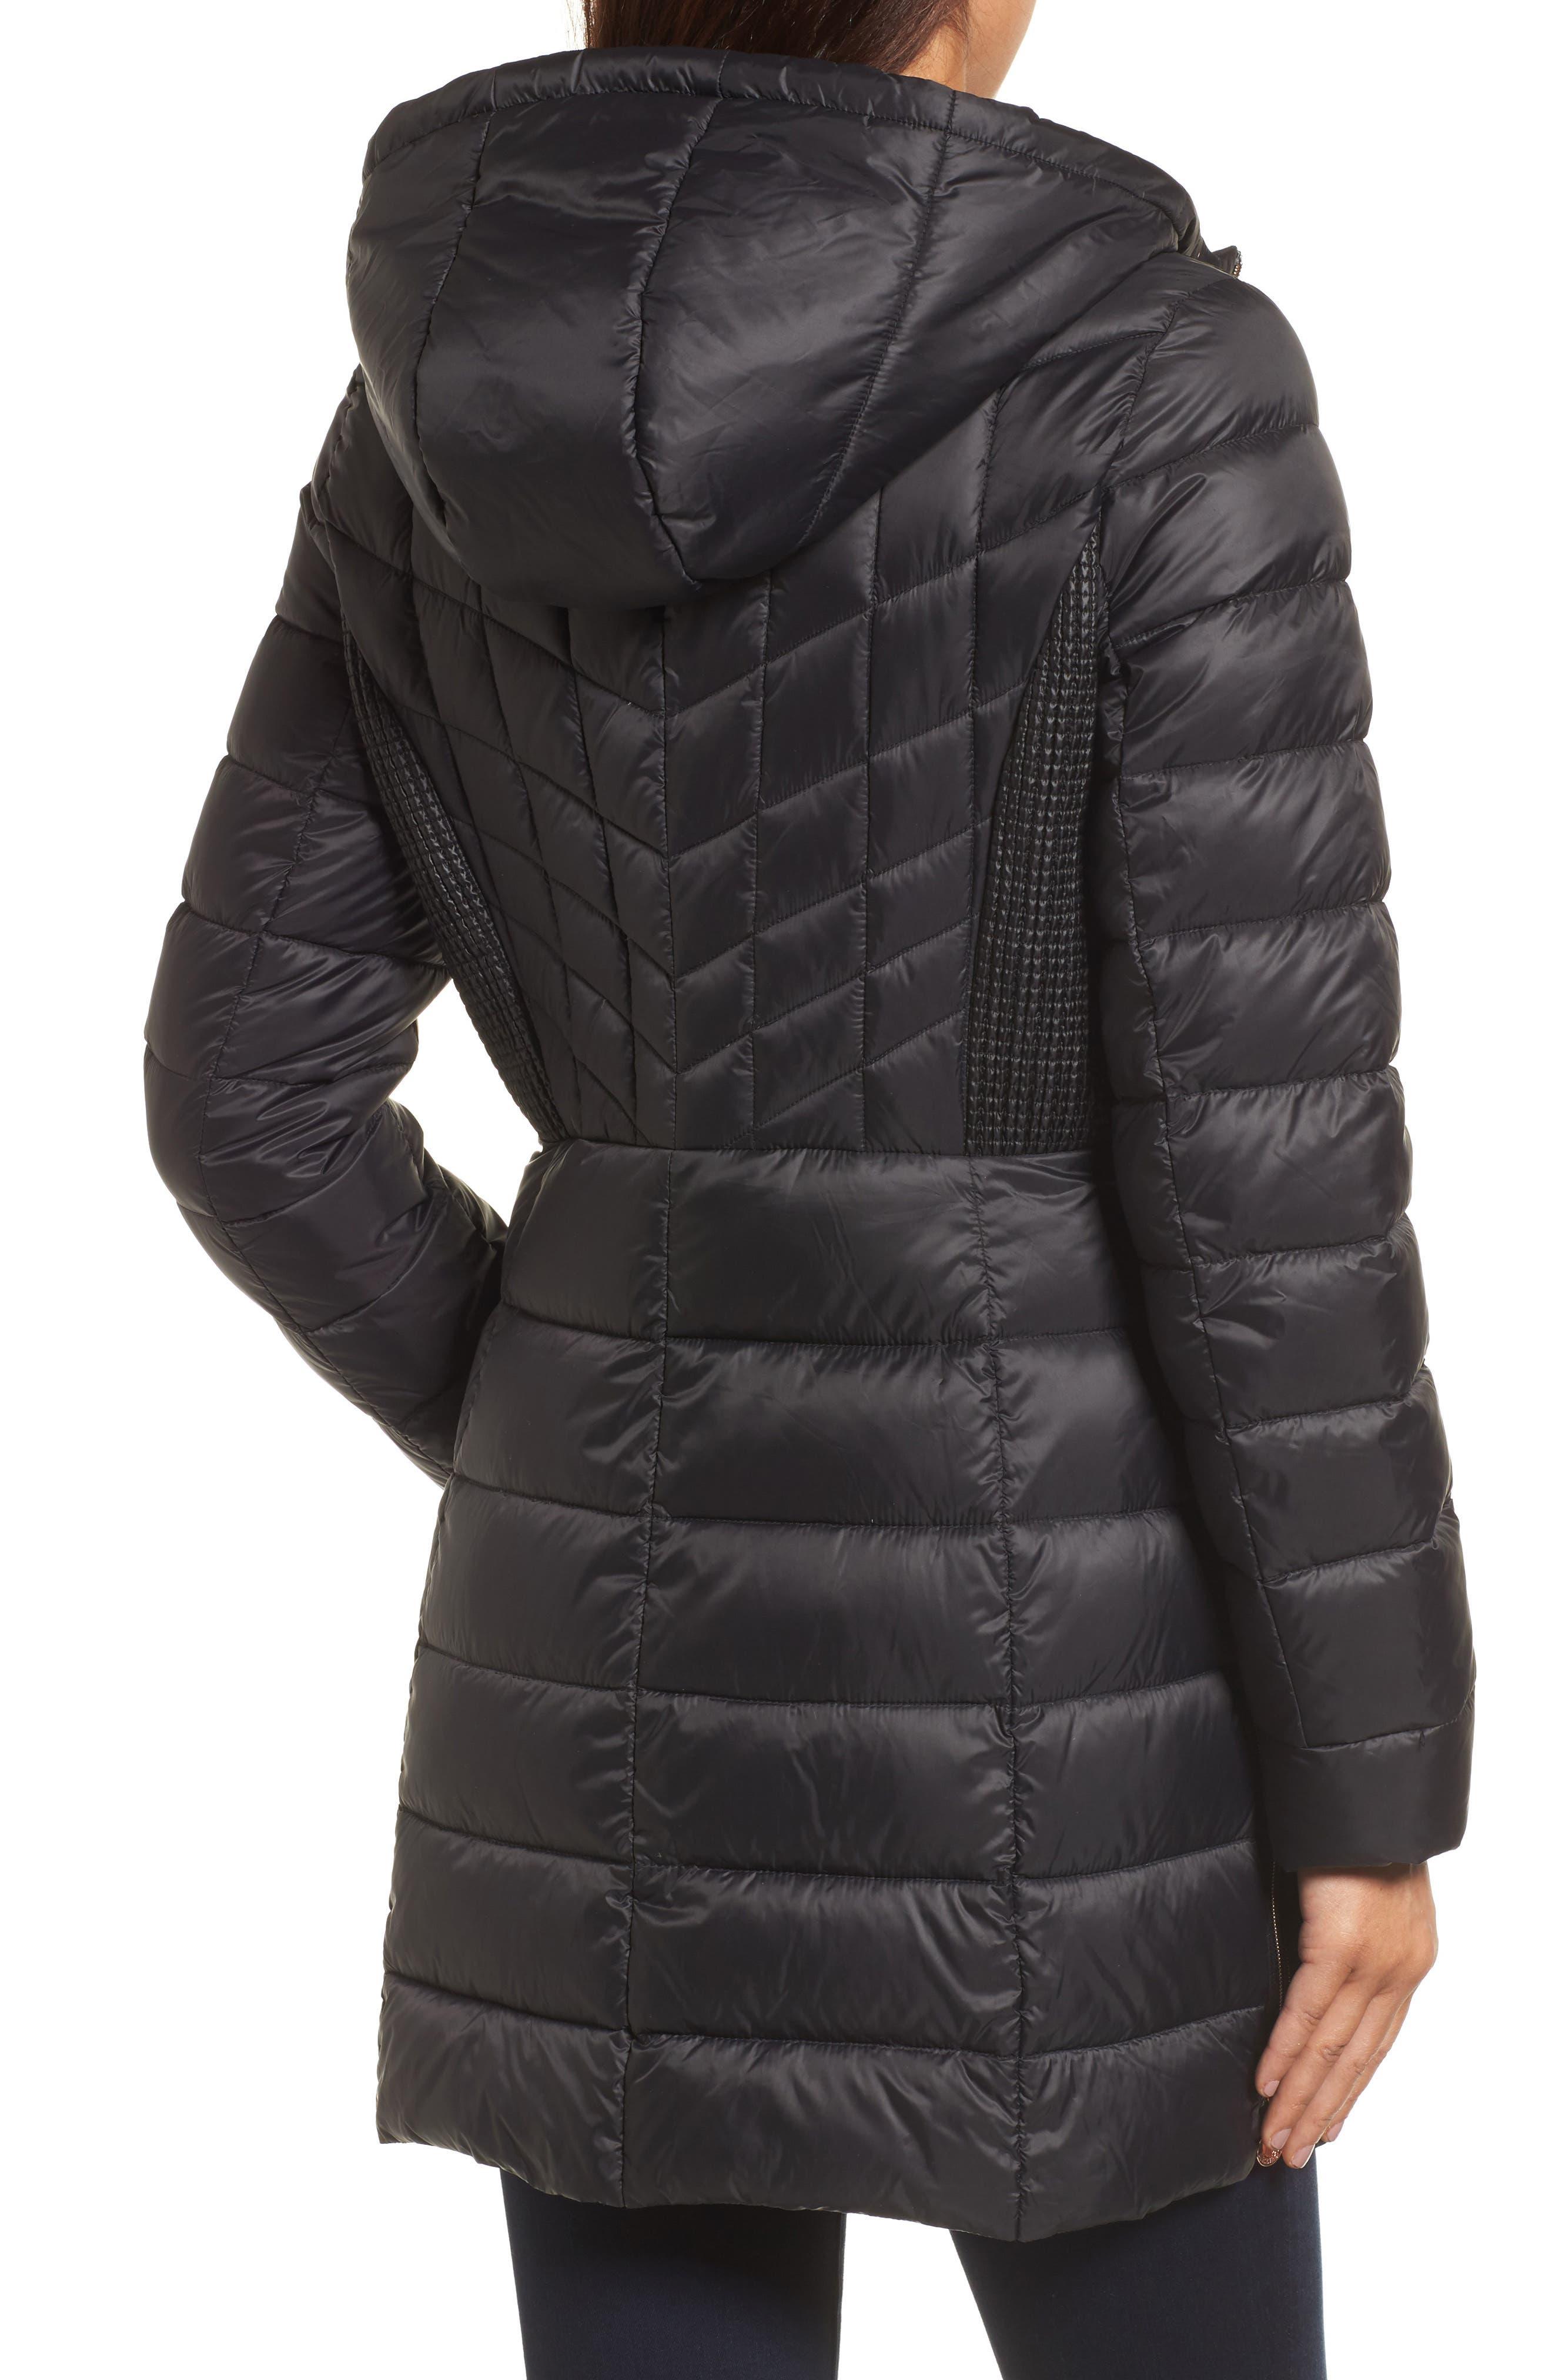 BERNARDO, Hooded Packable Down & PrimaLoft<sup>®</sup> Coat, Alternate thumbnail 2, color, BLACK